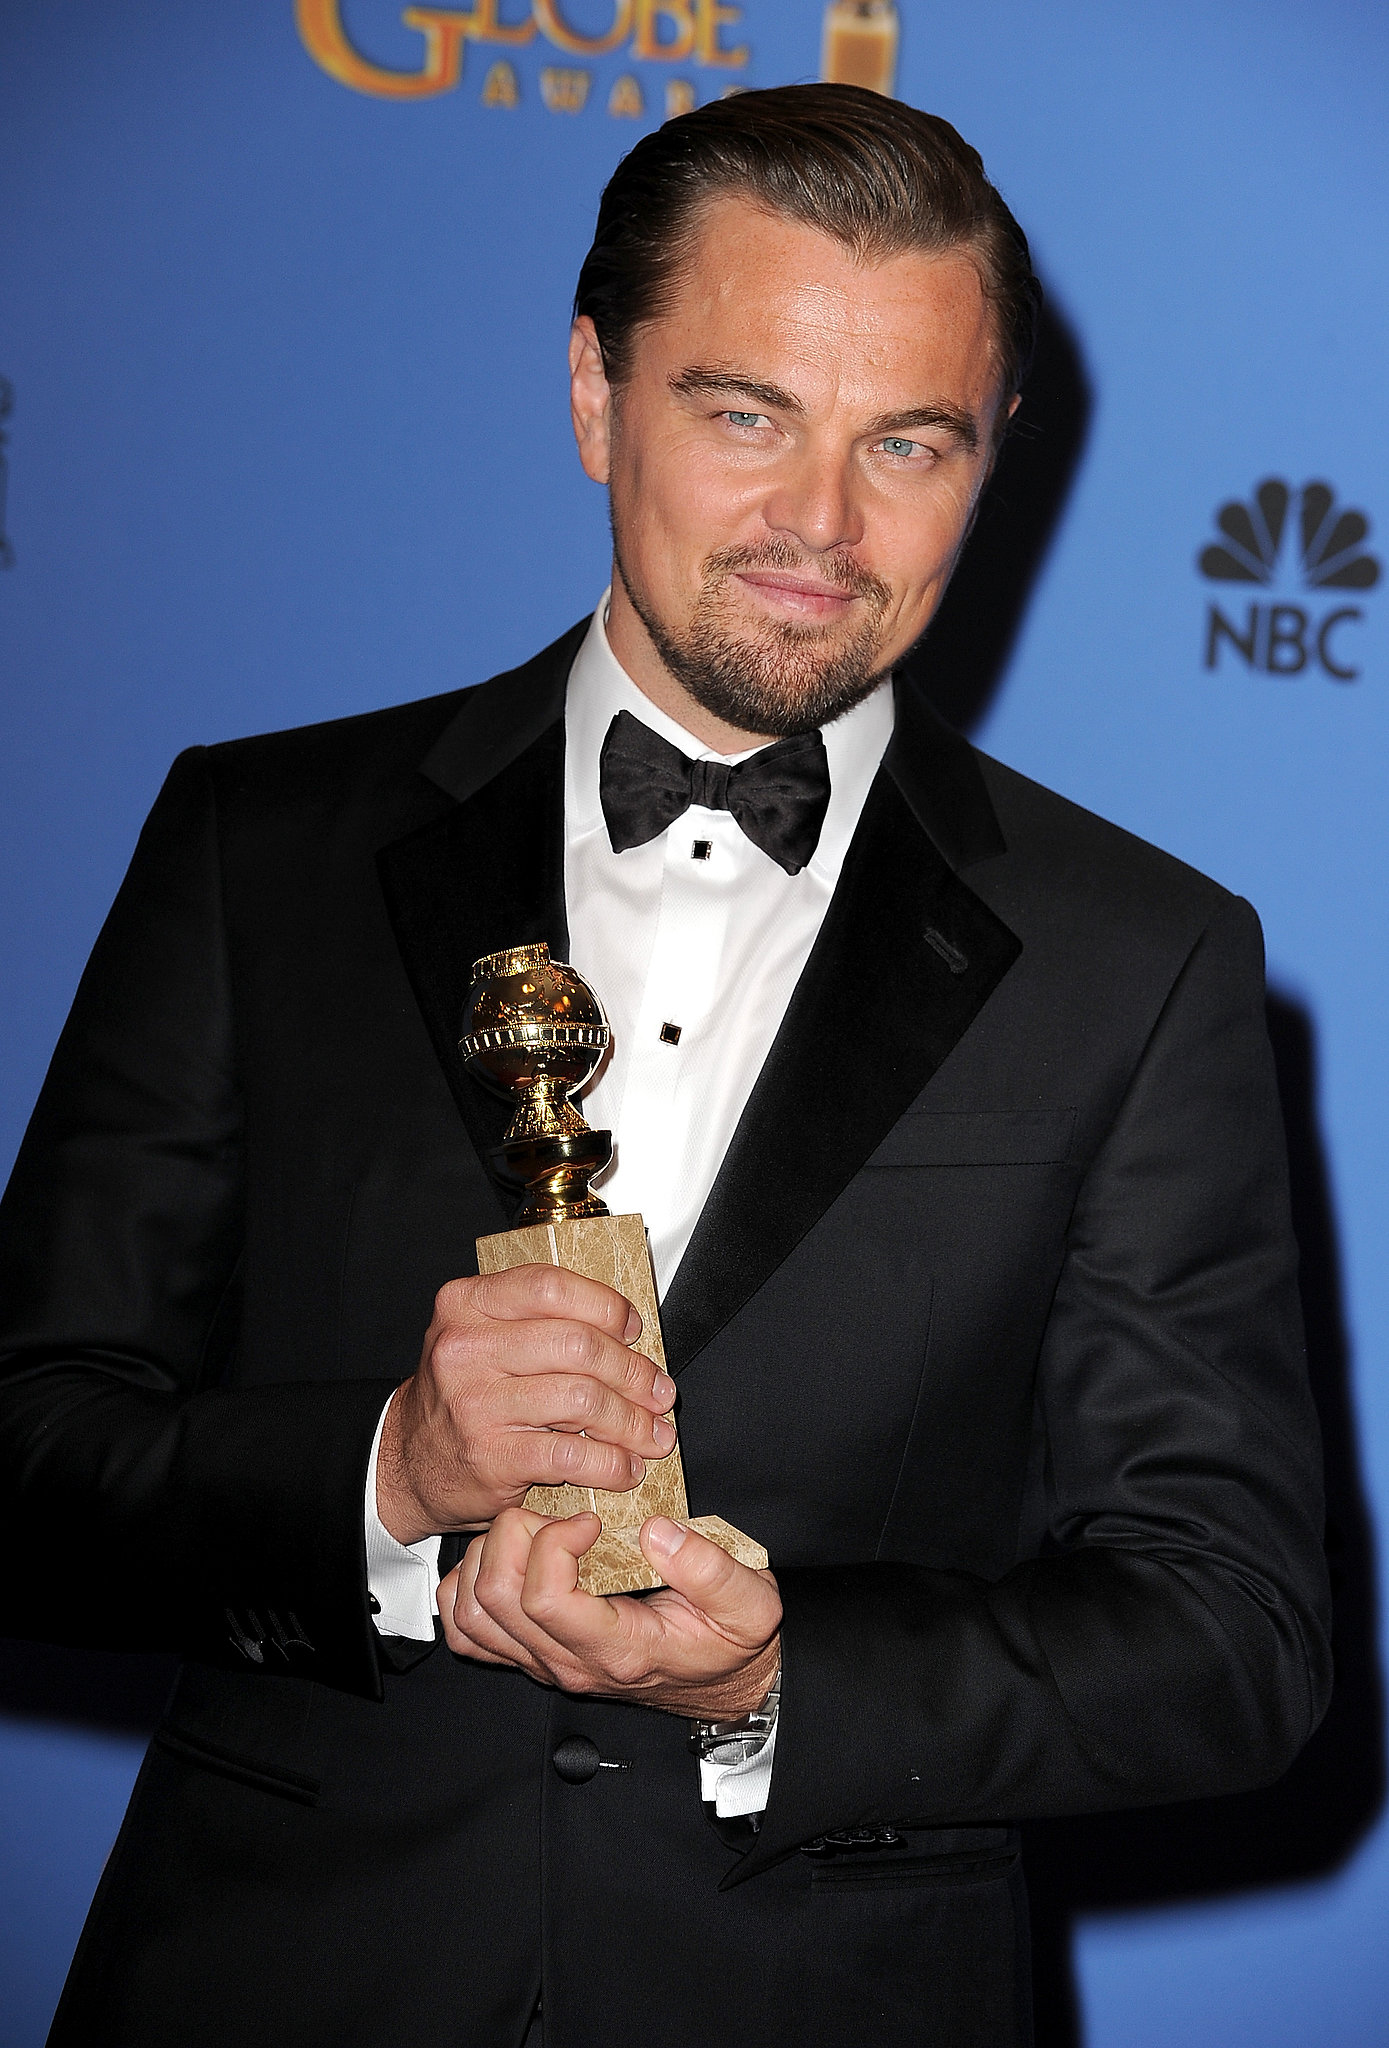 Leonardo DiCaprio looked sincerely happy with his Golden Globe.